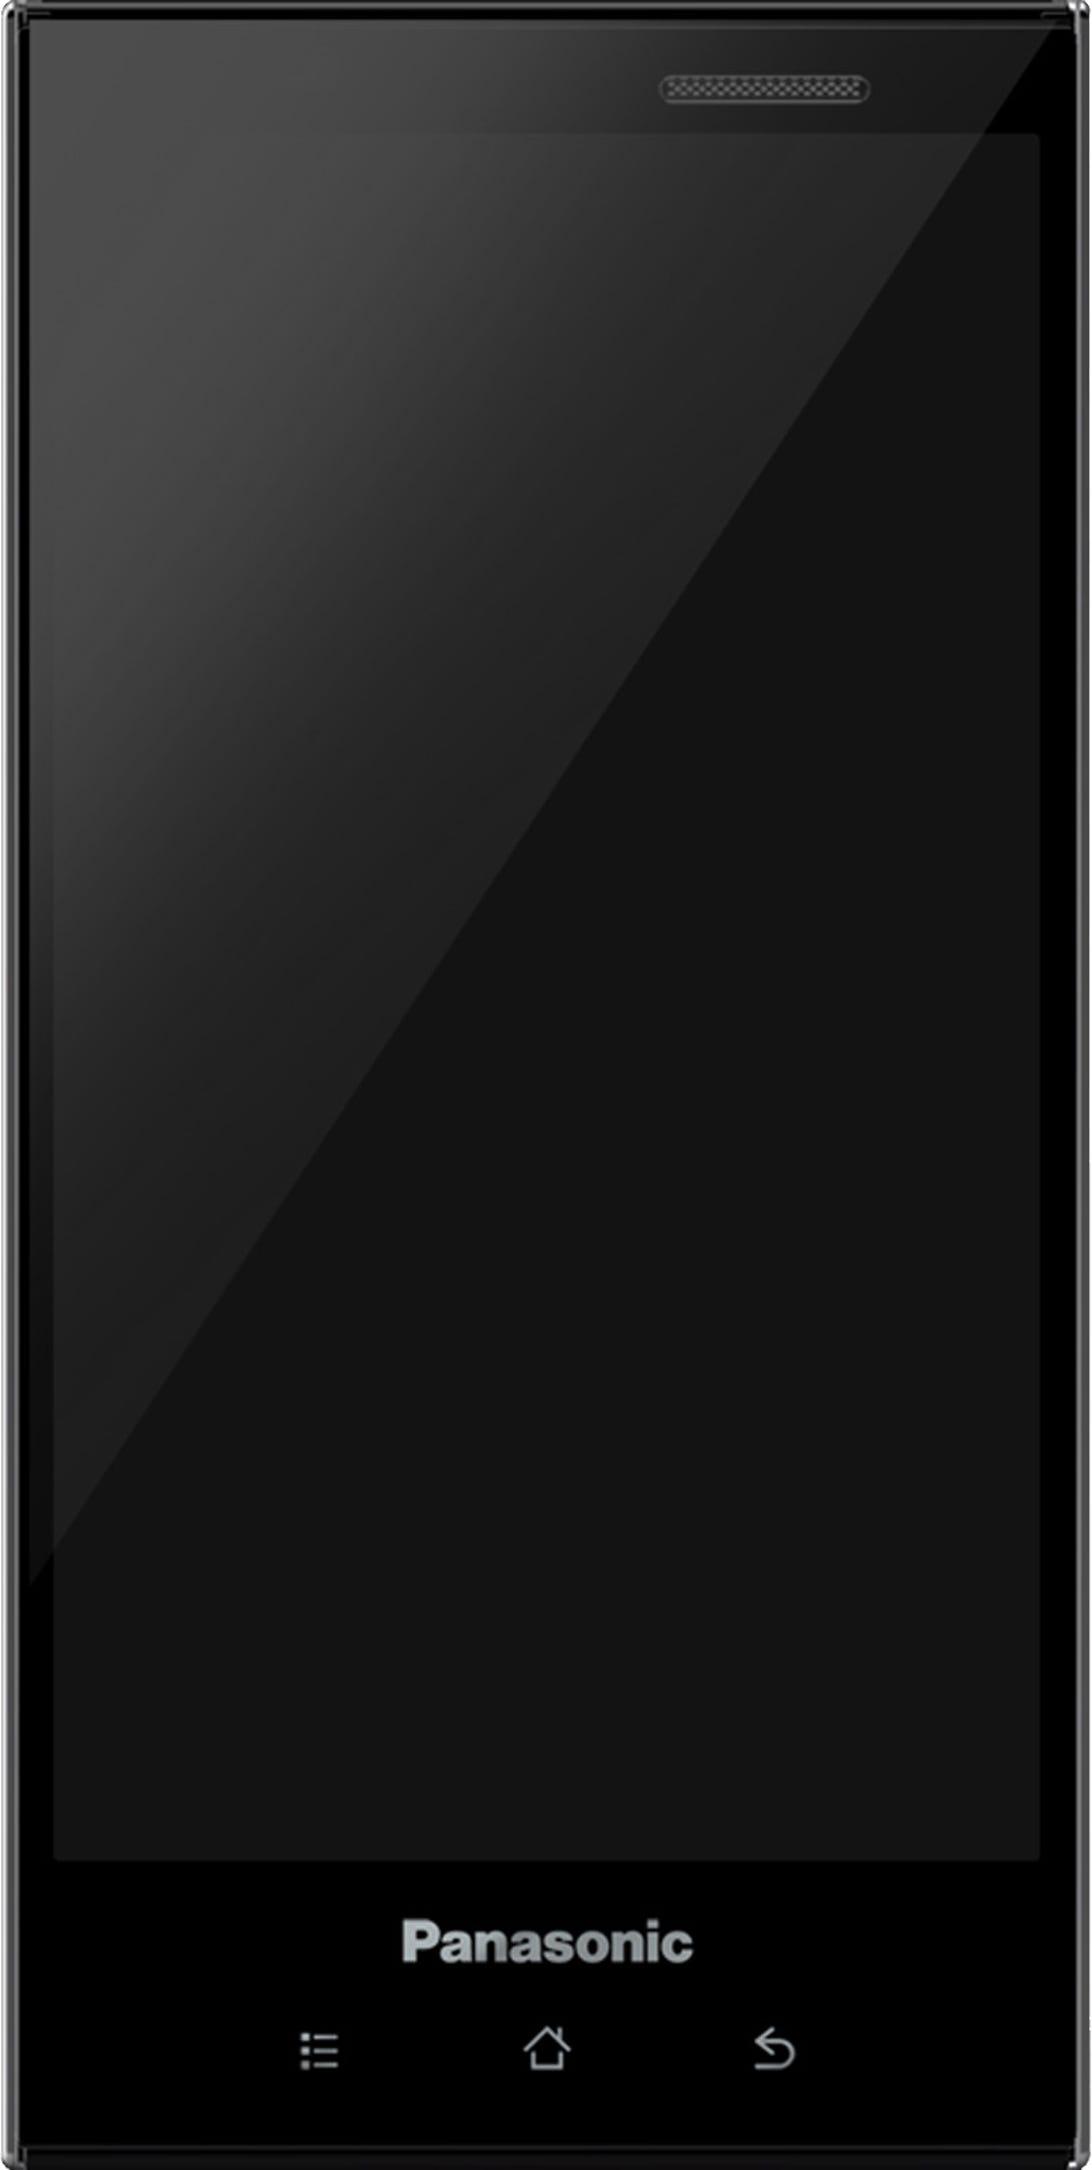 Panasonic_Android_prototype_black_01.jpg